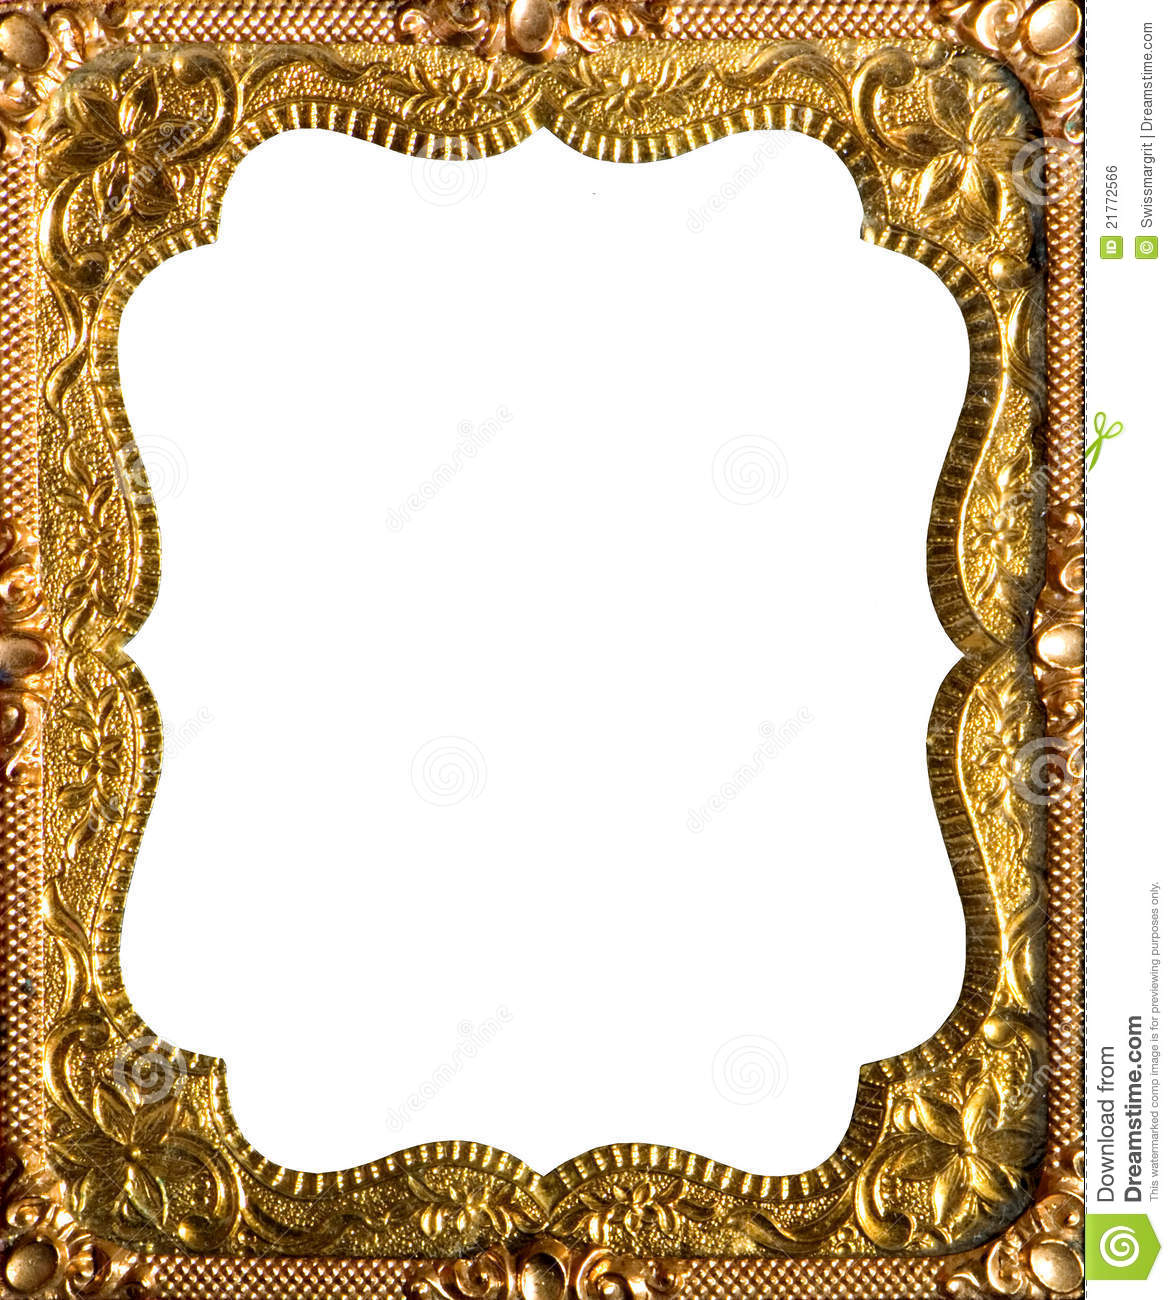 Clipart Frames-clipart frames-2